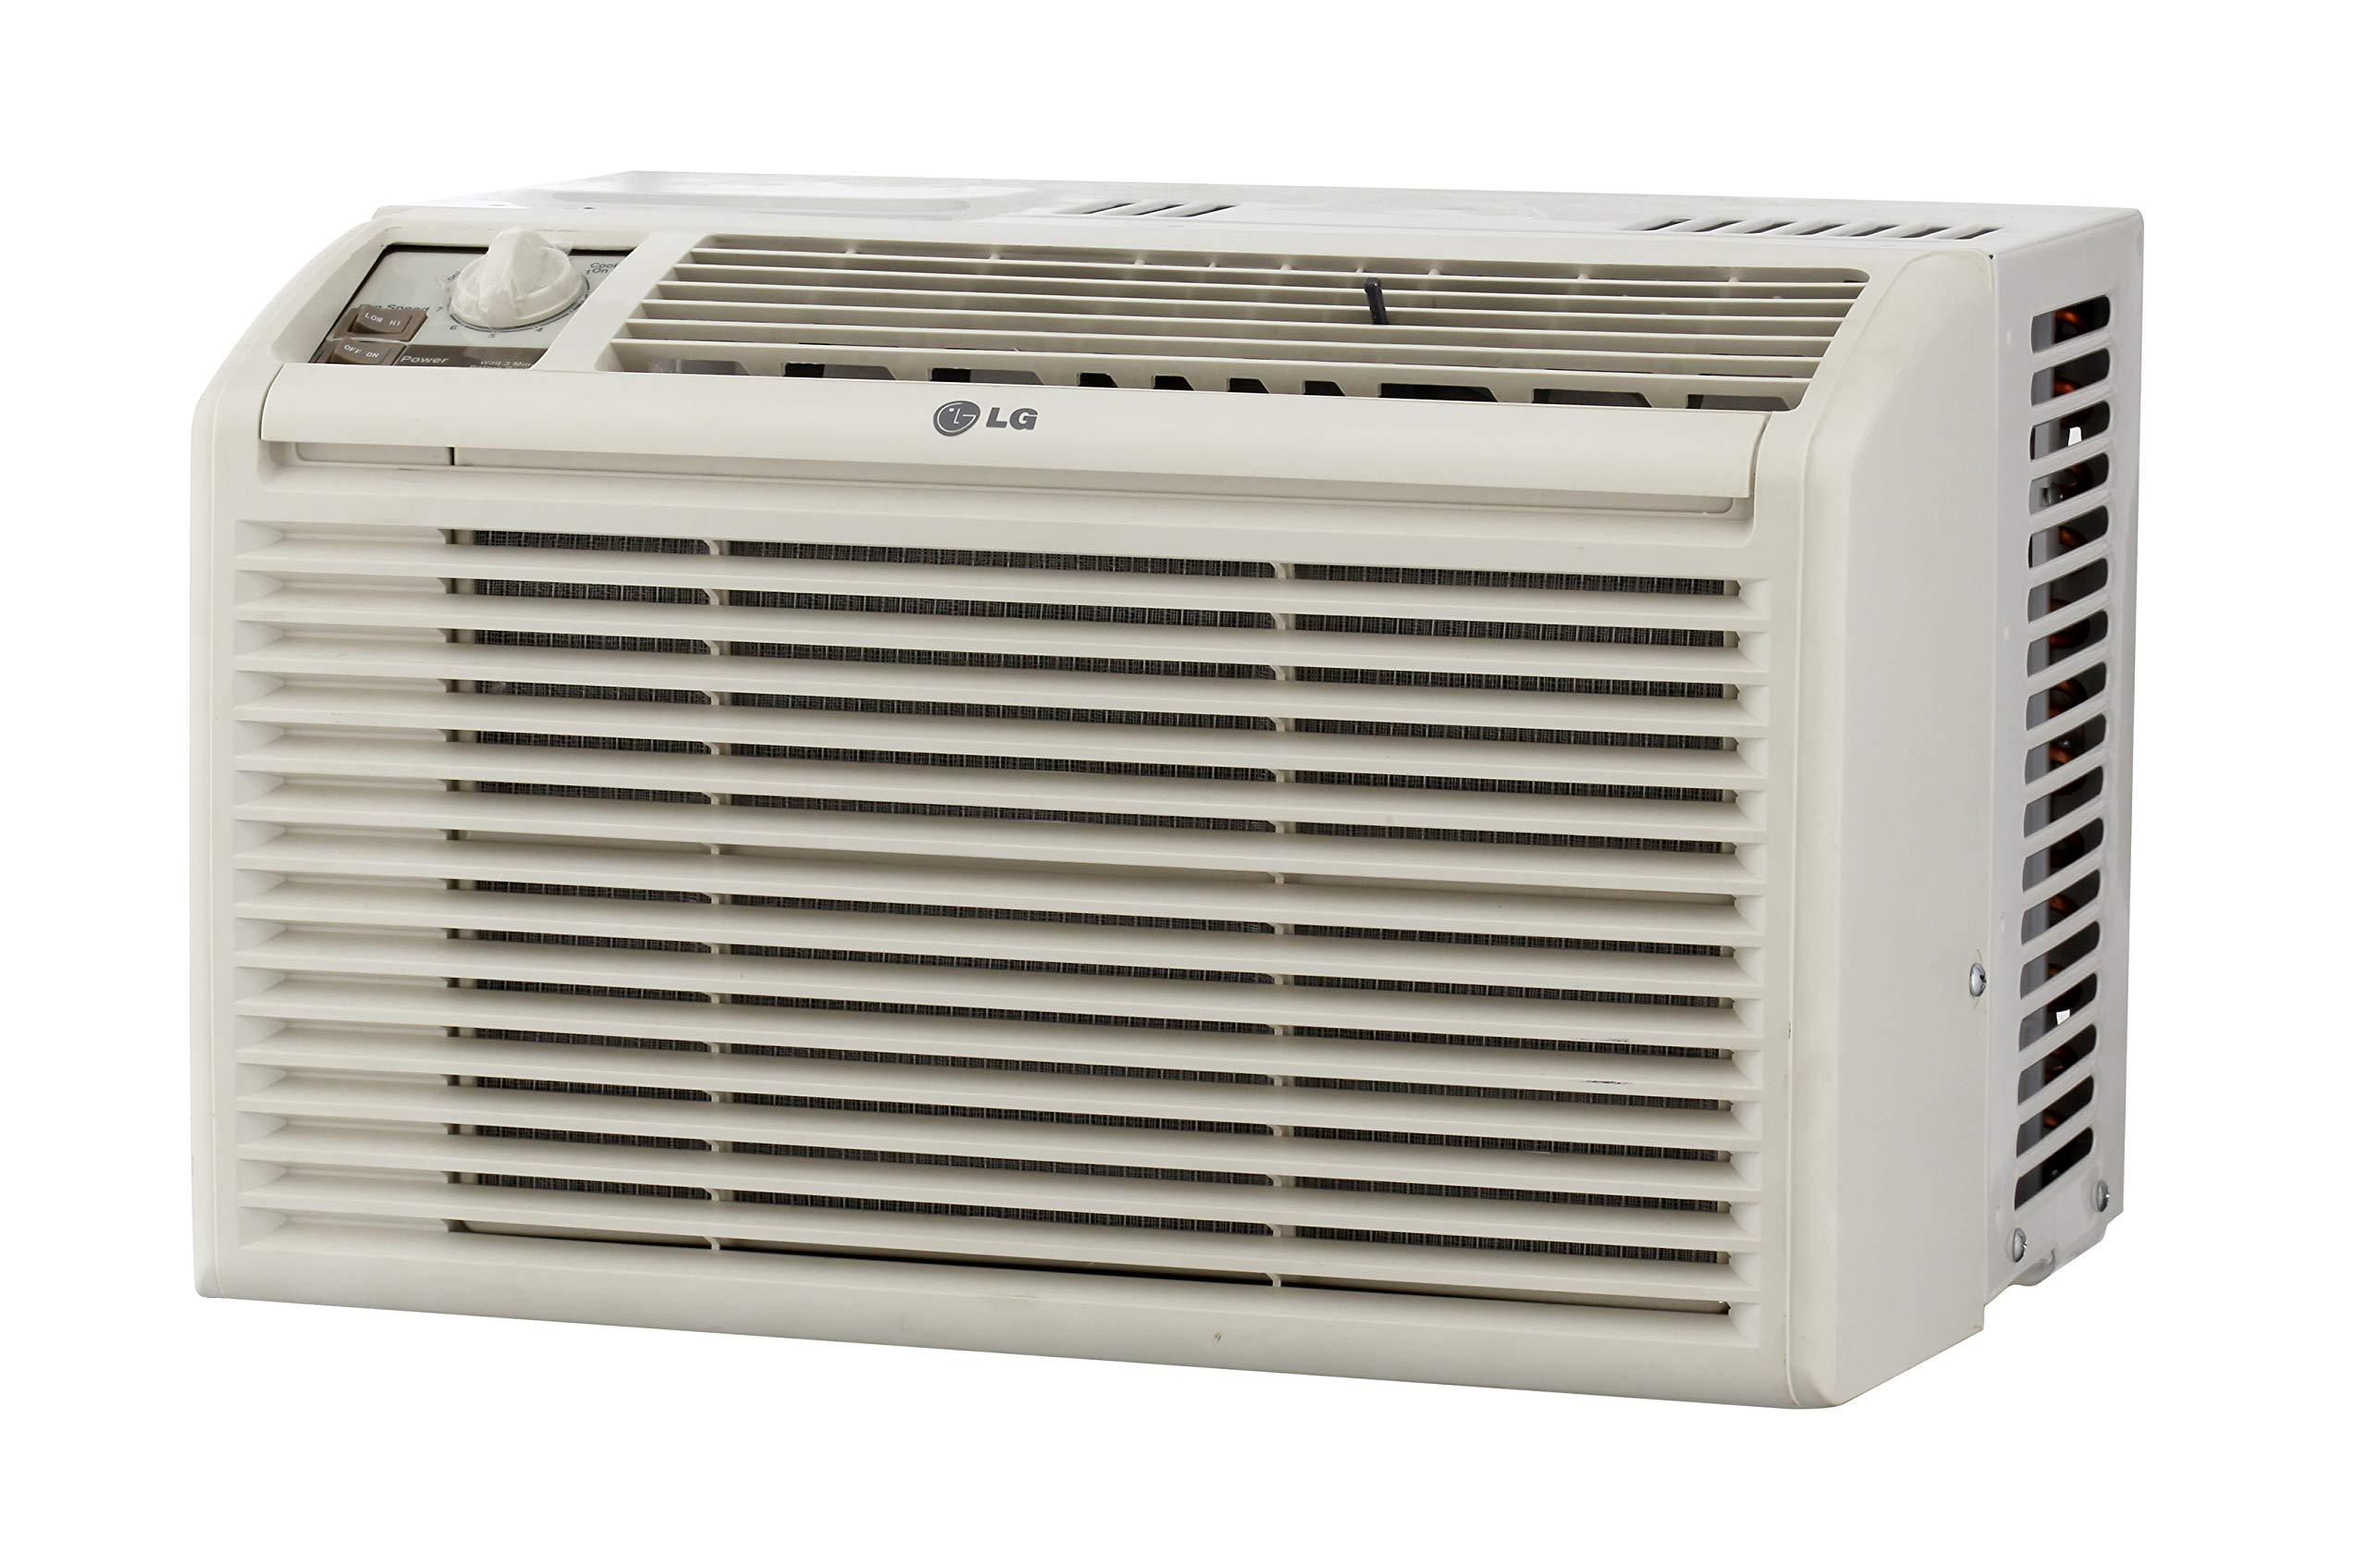 LG Electronics LW5016 115 Volt Conditioner